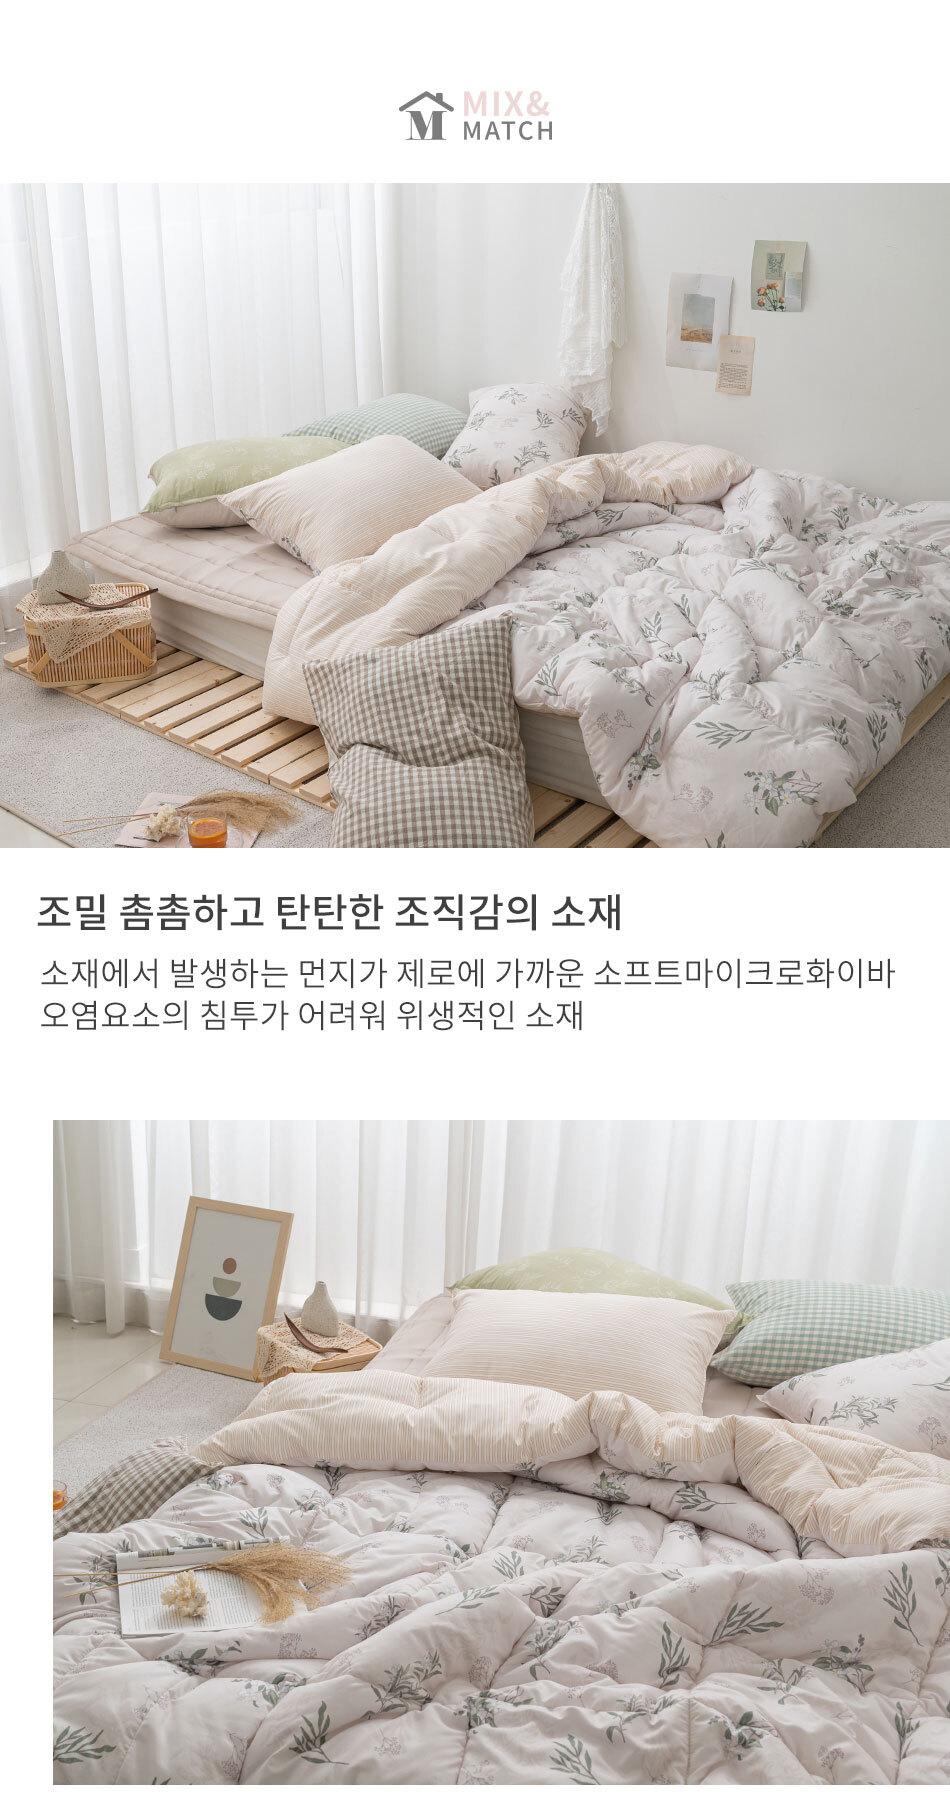 bailey_bed_01.jpg